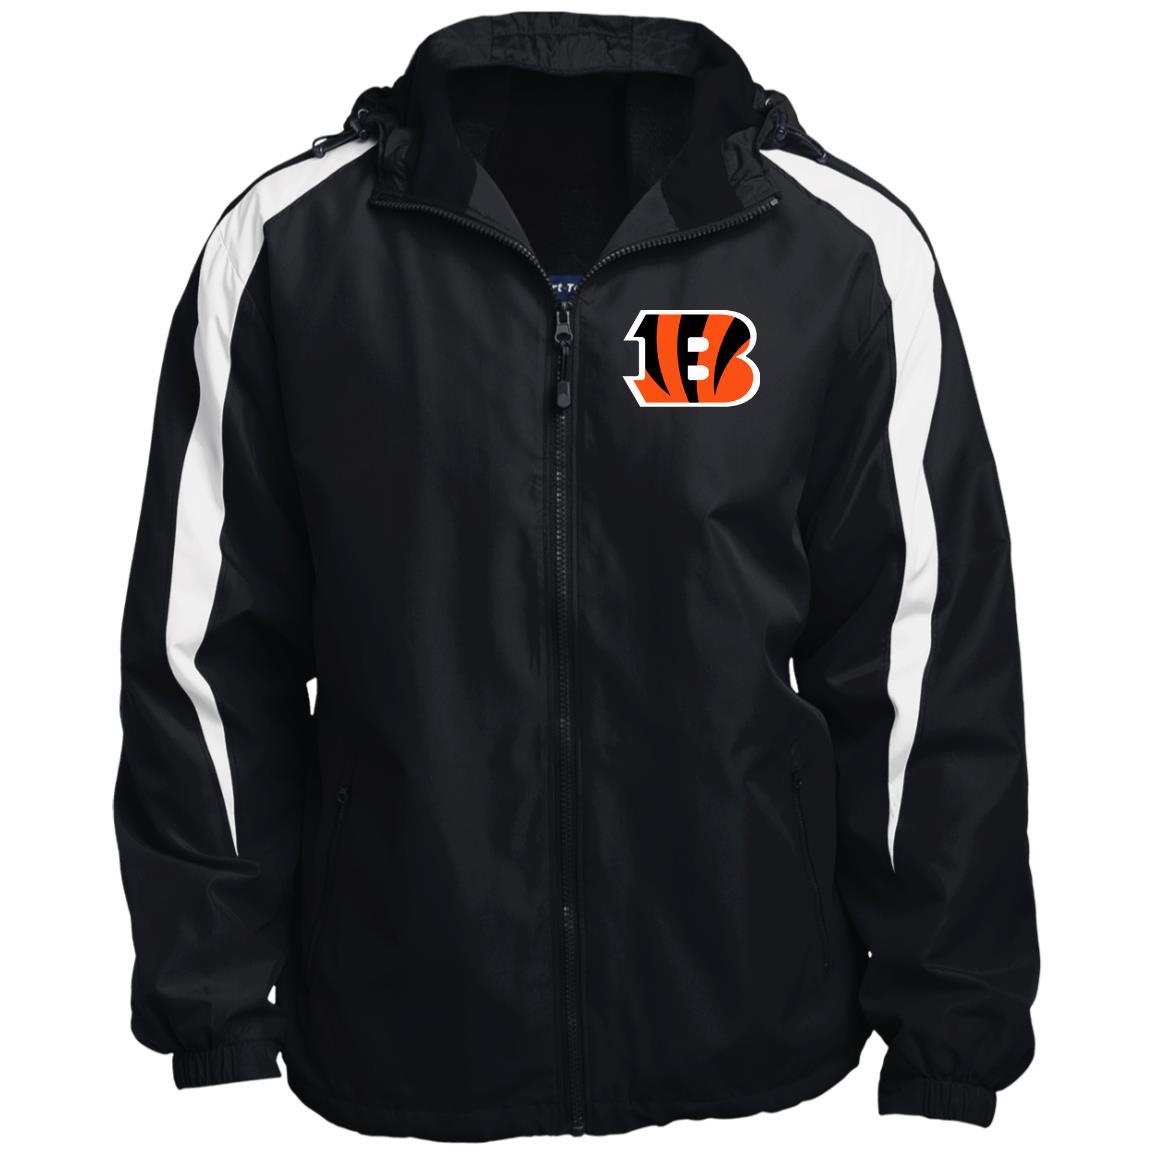 Private: Cincinnati Bengals Fleece Lined Colorblocked Hooded Jacket